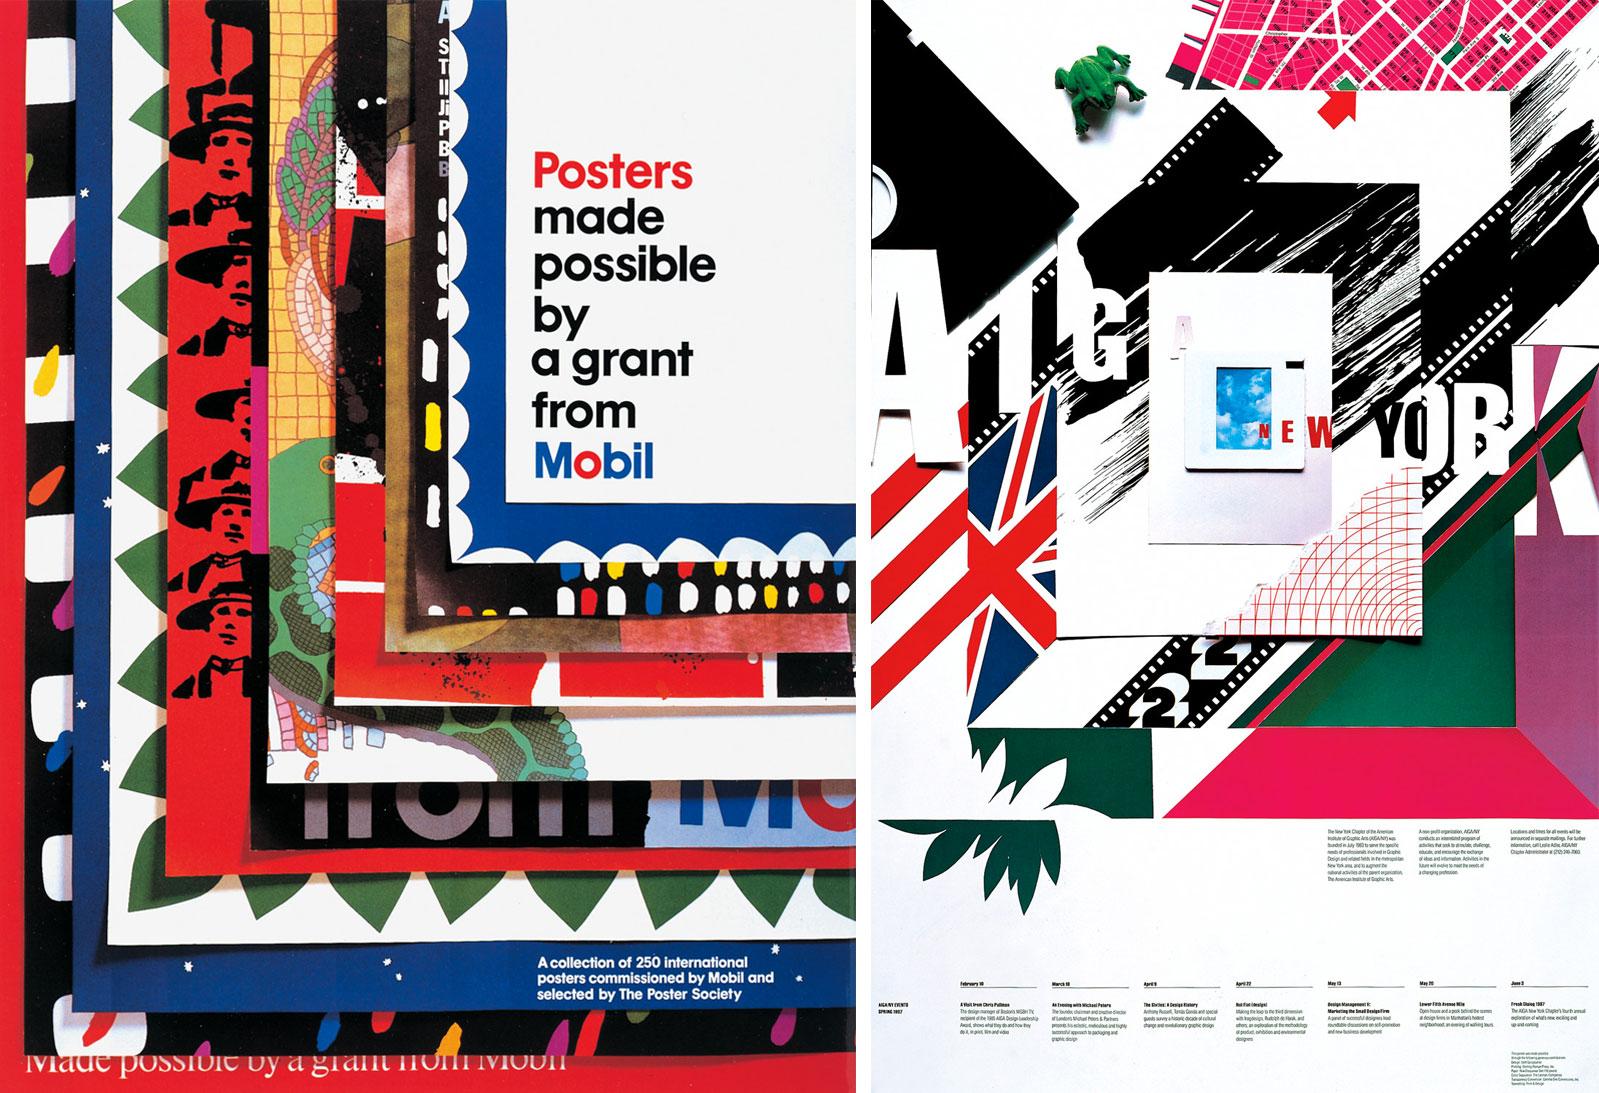 Chermayeff-and-Geismar-posters-03